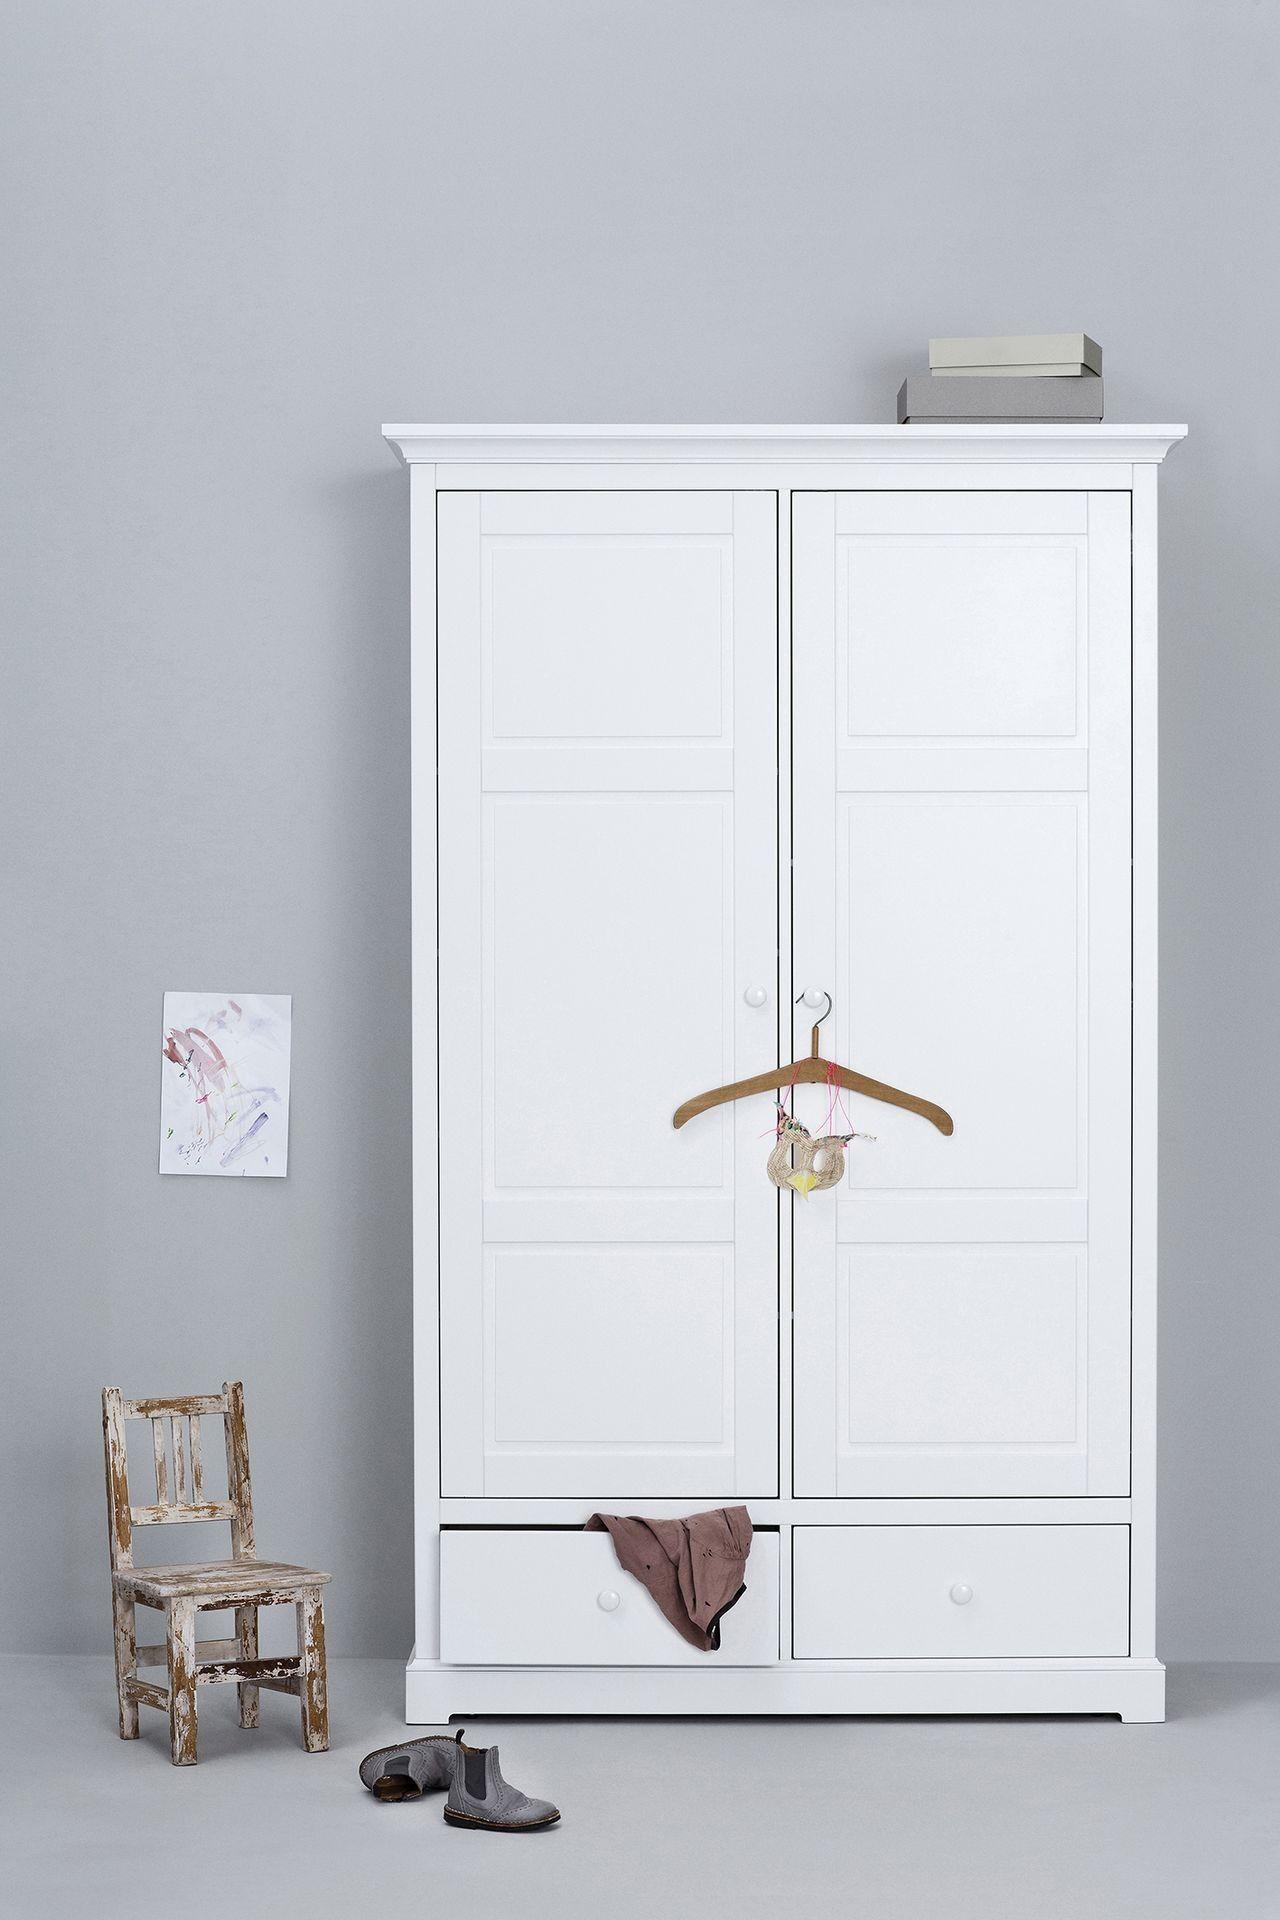 Oliver Furniture Kleiderschrank Seaside 2 Türig Weiß Kleiderschrank Kinderzimmer Kleiderschrank Jugendzimmer Kleiderschrank